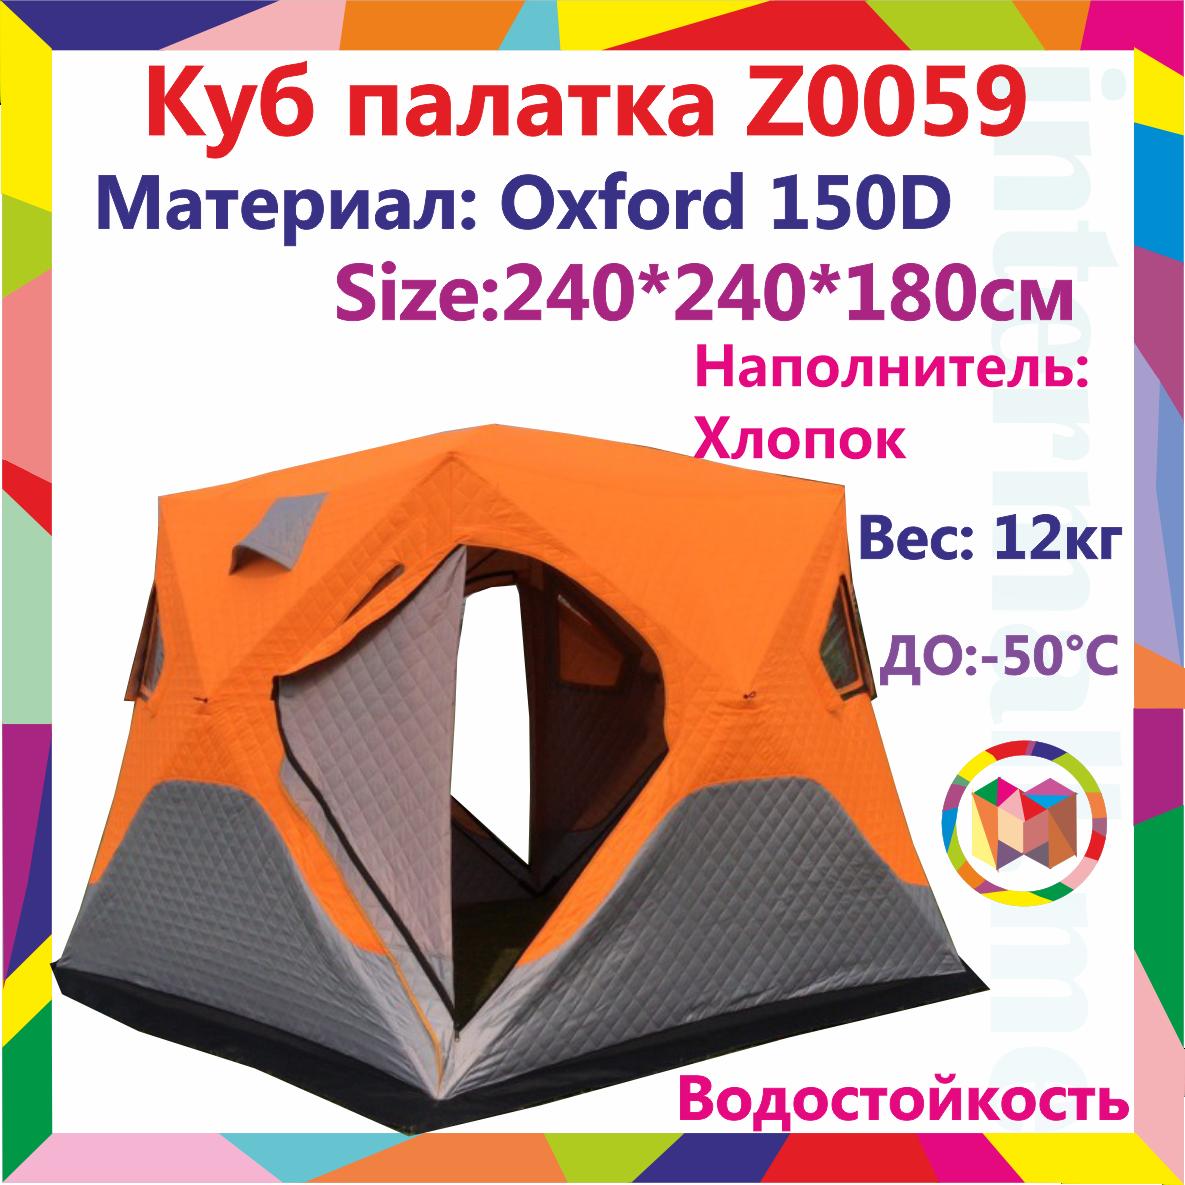 Утепленная Зимняя палатка куб 3-х слойная для зимней рыбалки,  240*240*180 см, Min Mimir-2017